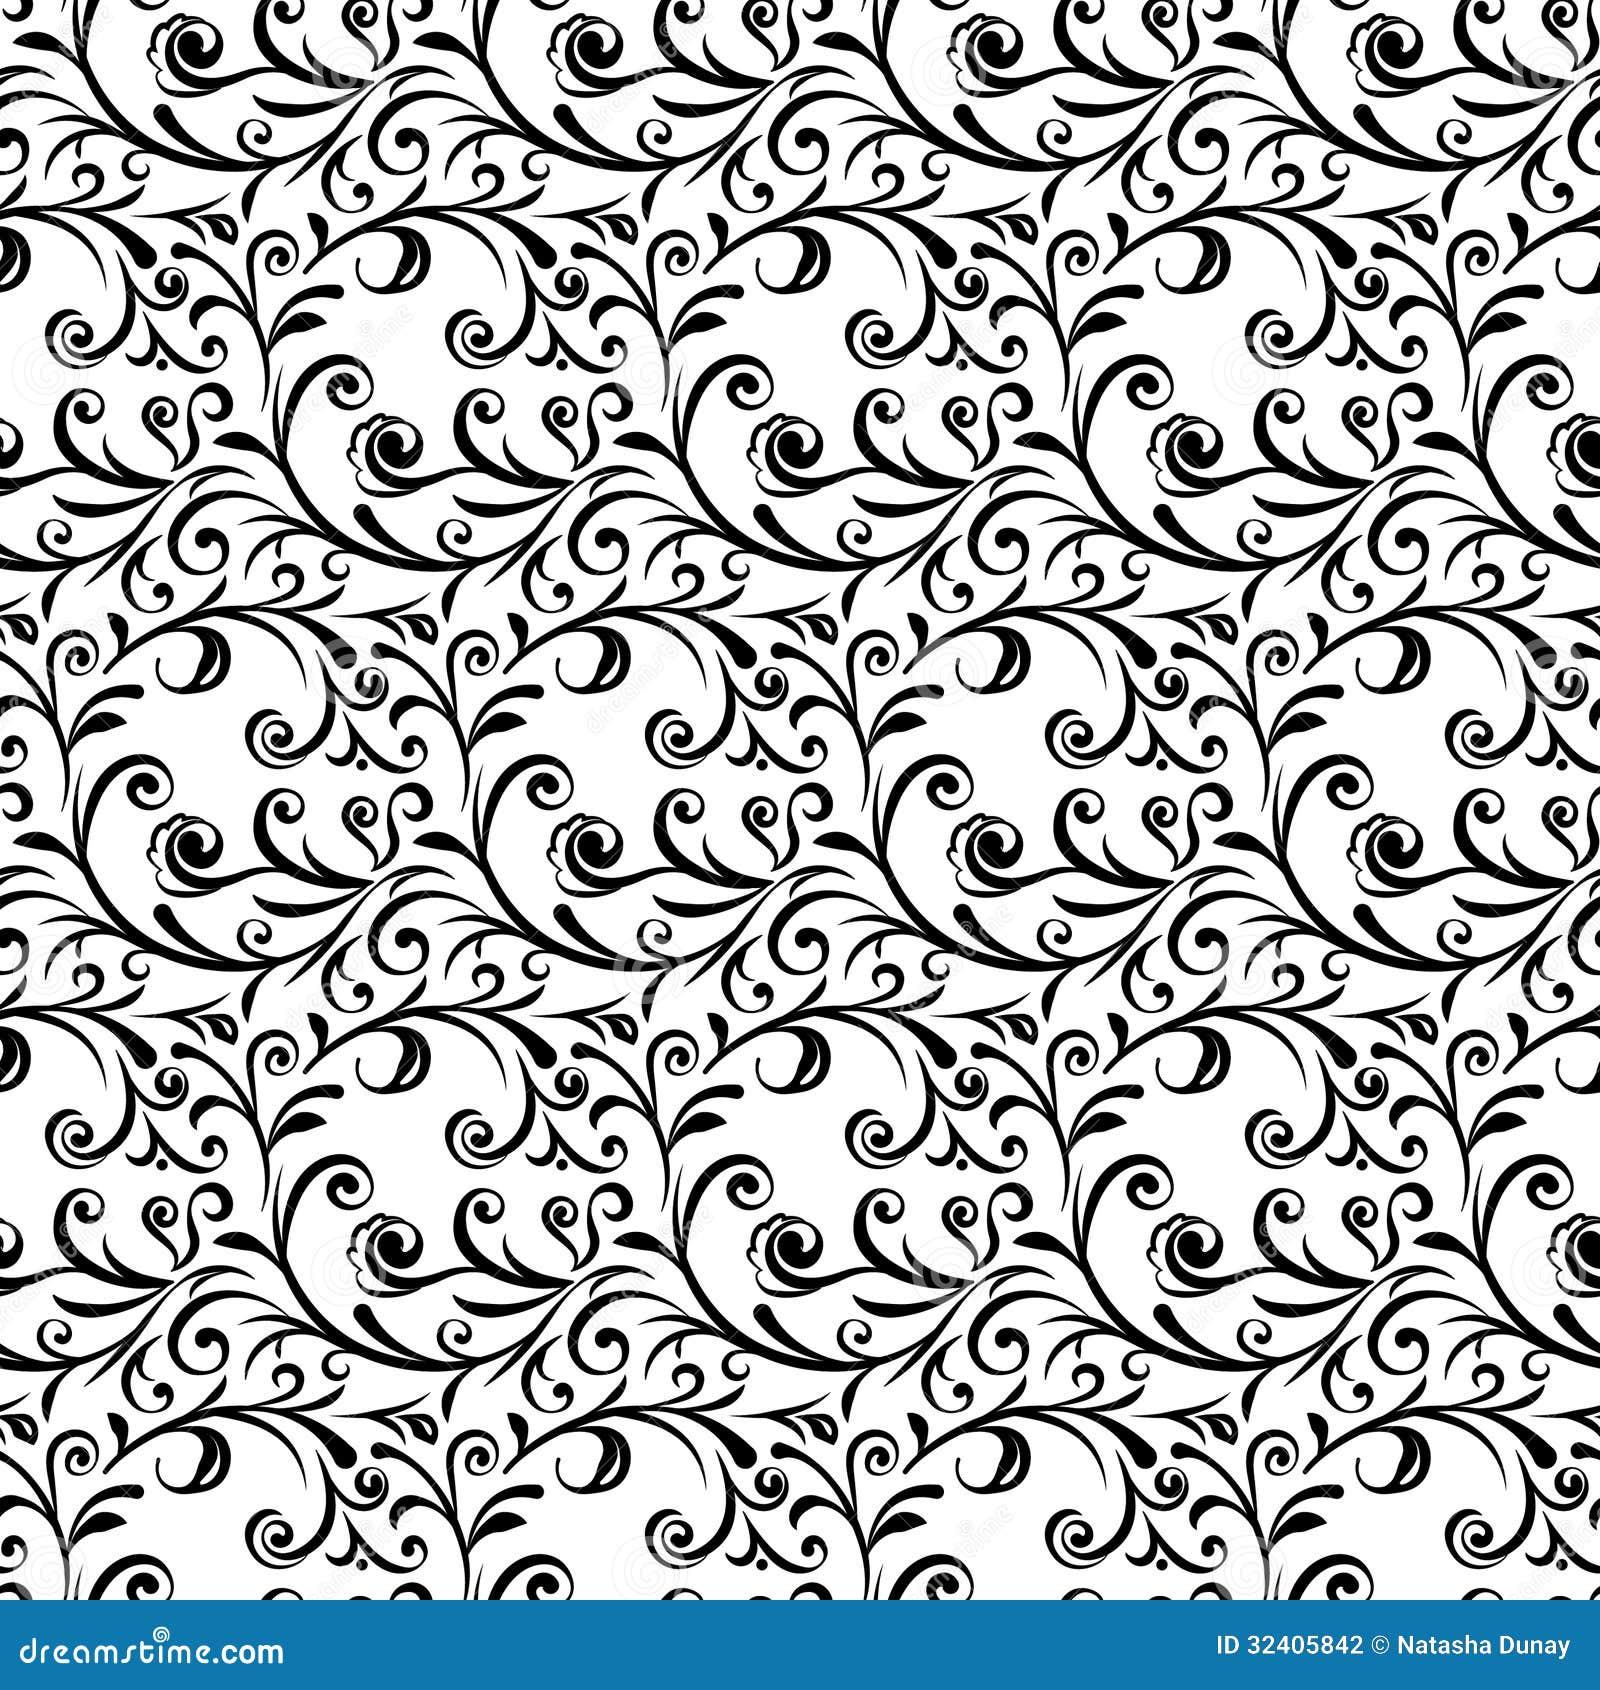 Inkscape Tutorial Floral Motif  Very Simple Designs